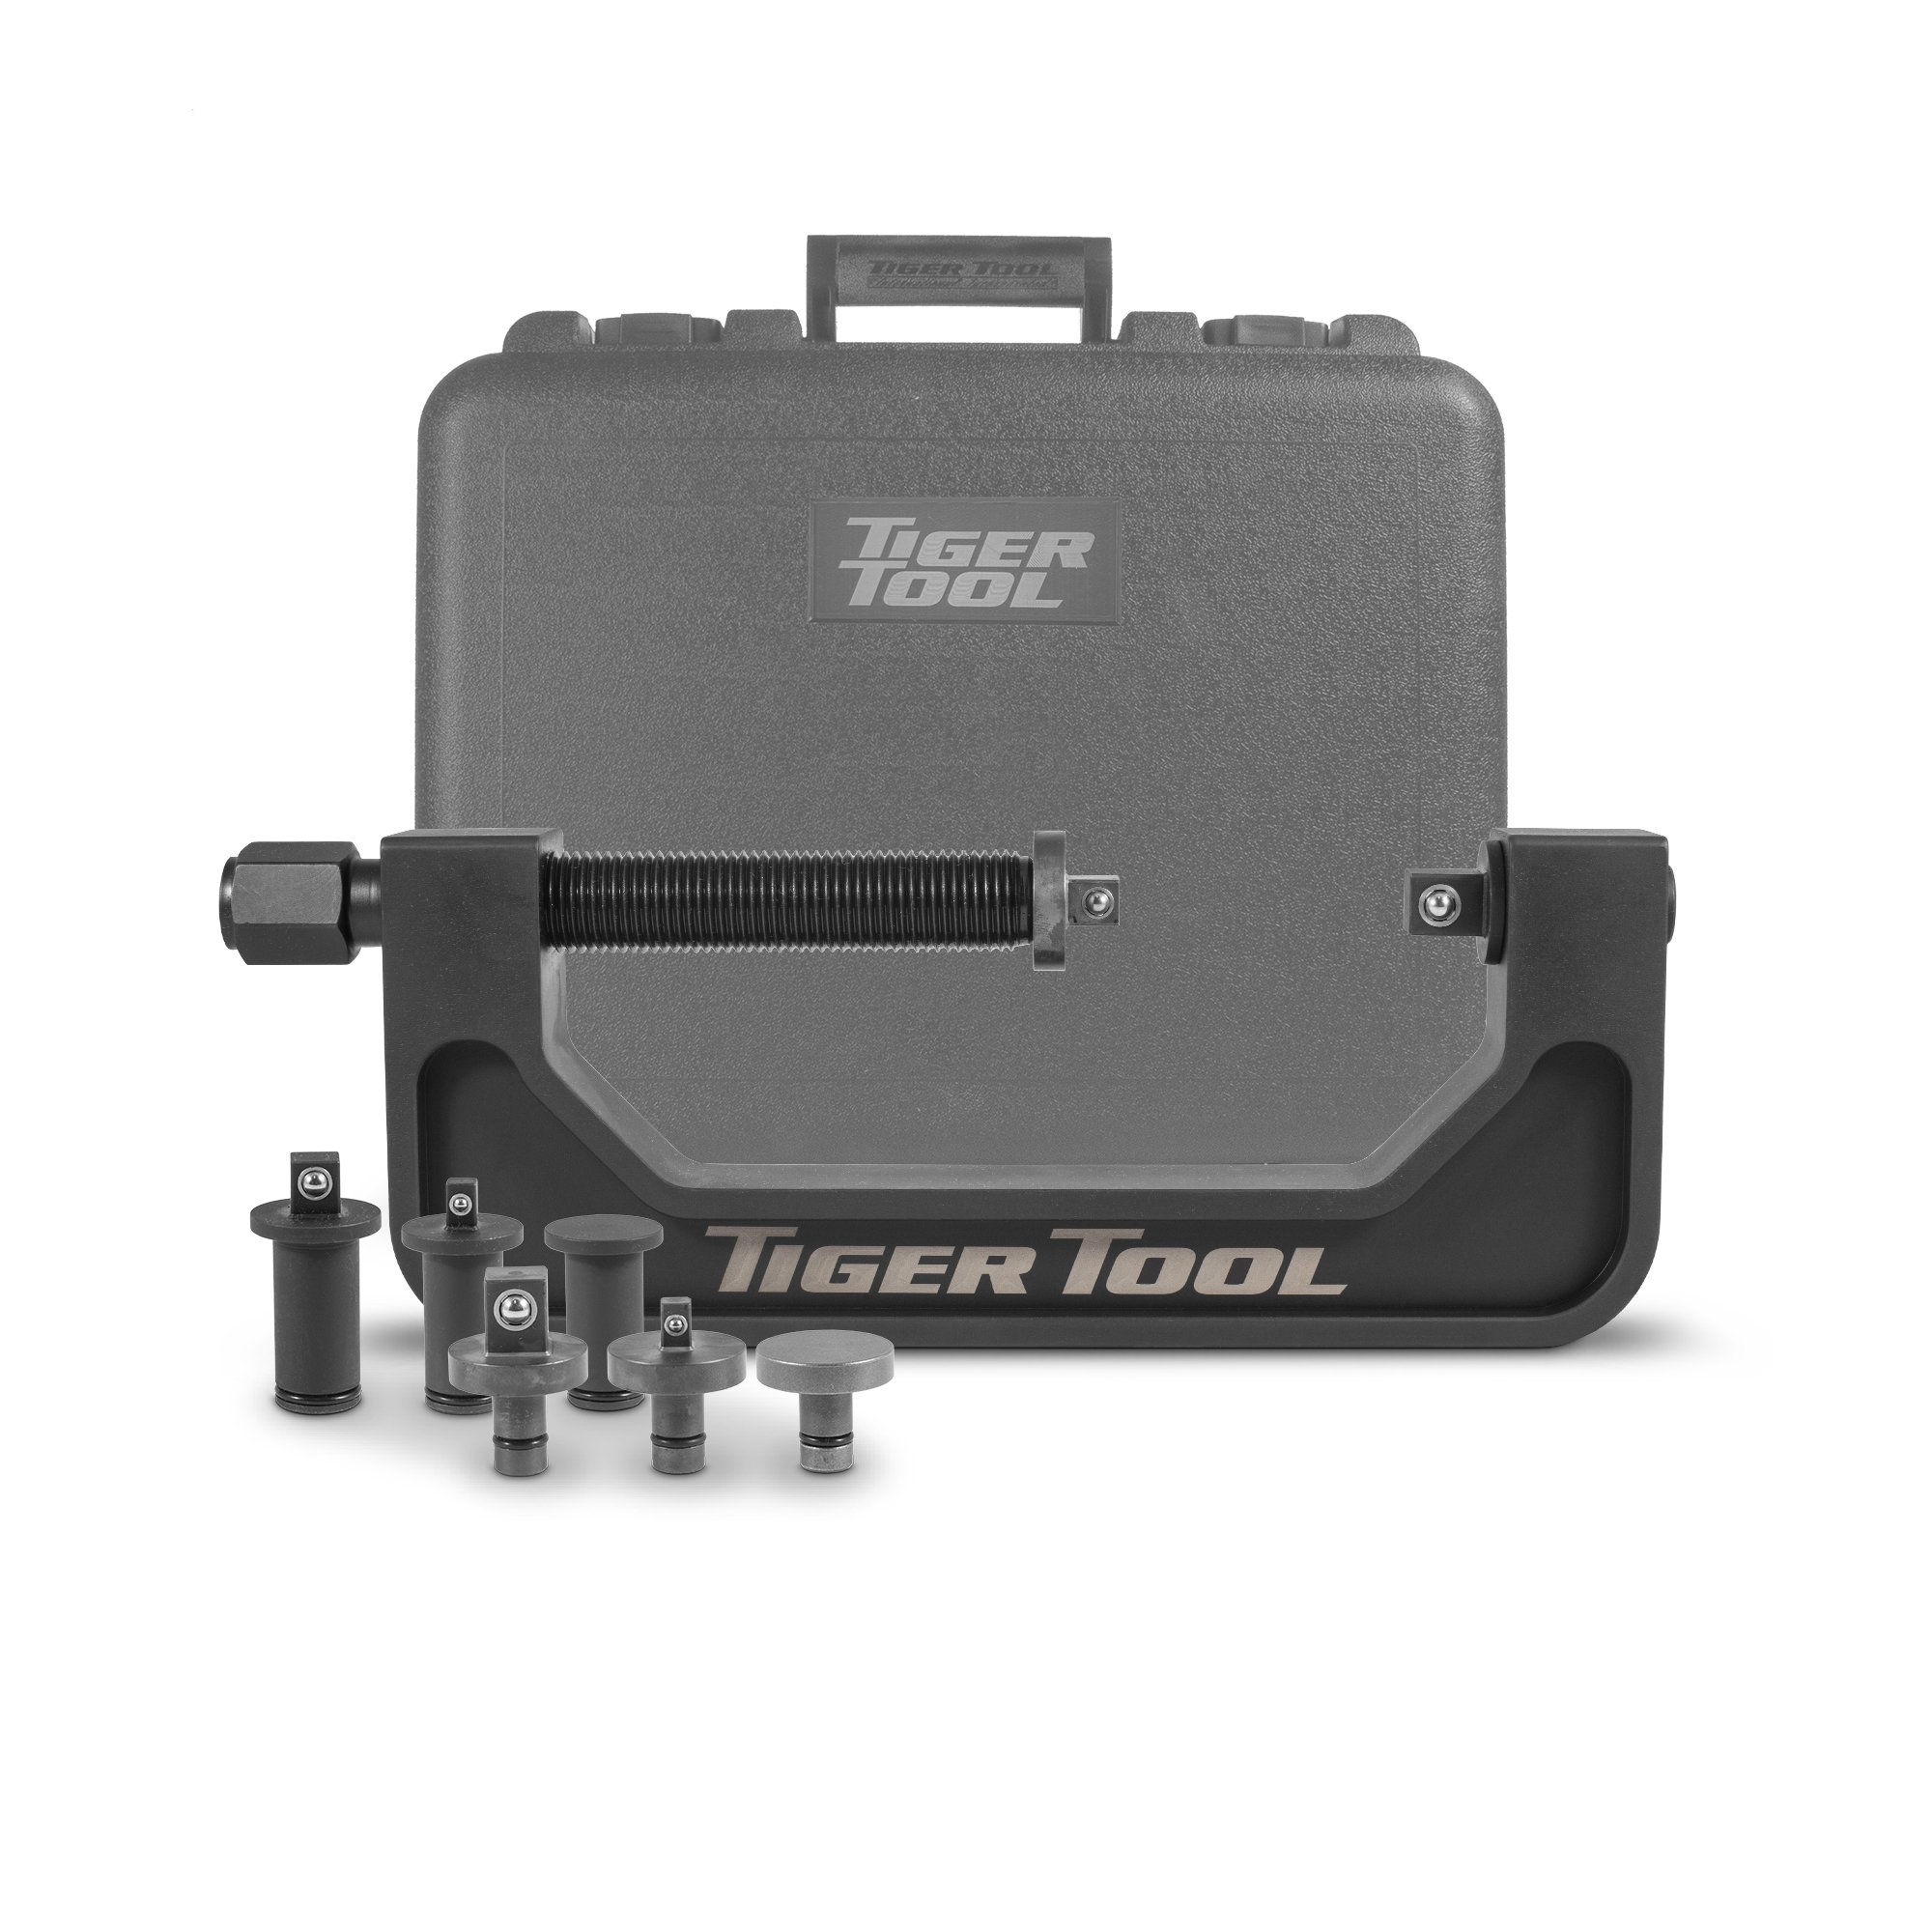 Tiger Tool Automotive C-Frame Socket Press 10205 by Tiger Tool (Image #1)